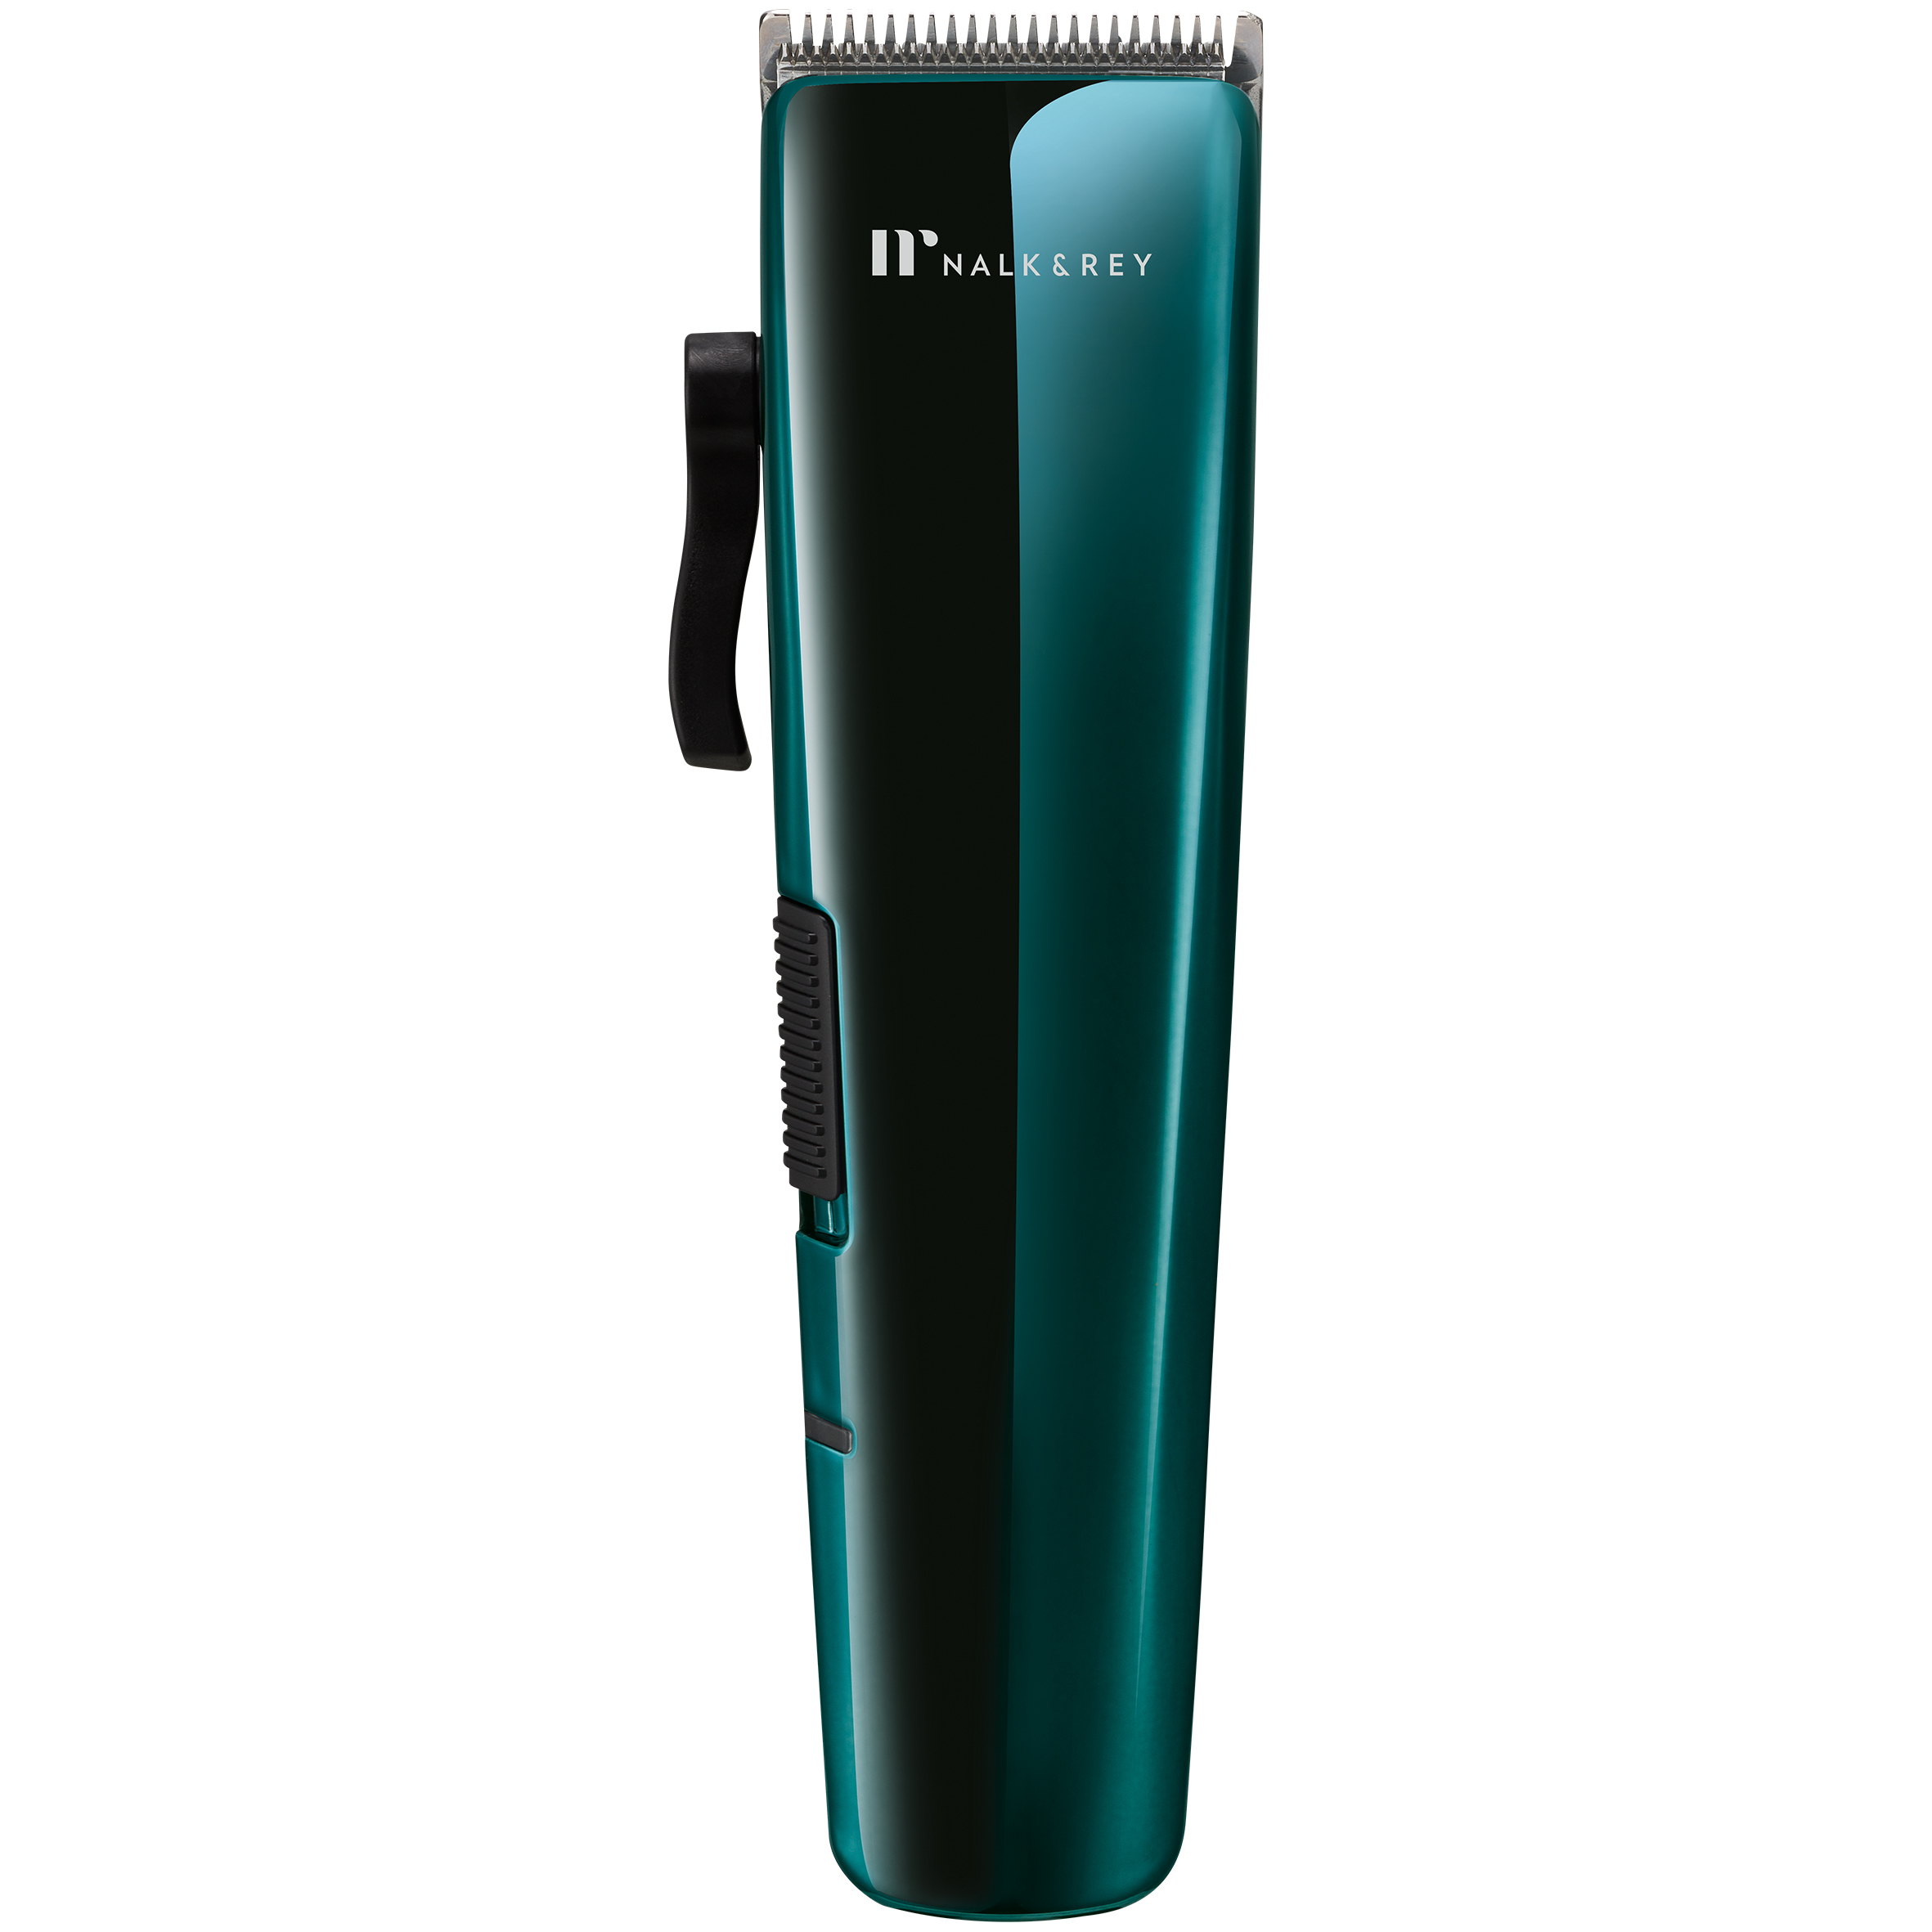 NALK AND REY Tondeuse à cheveux - NRHC40-18 - Vert